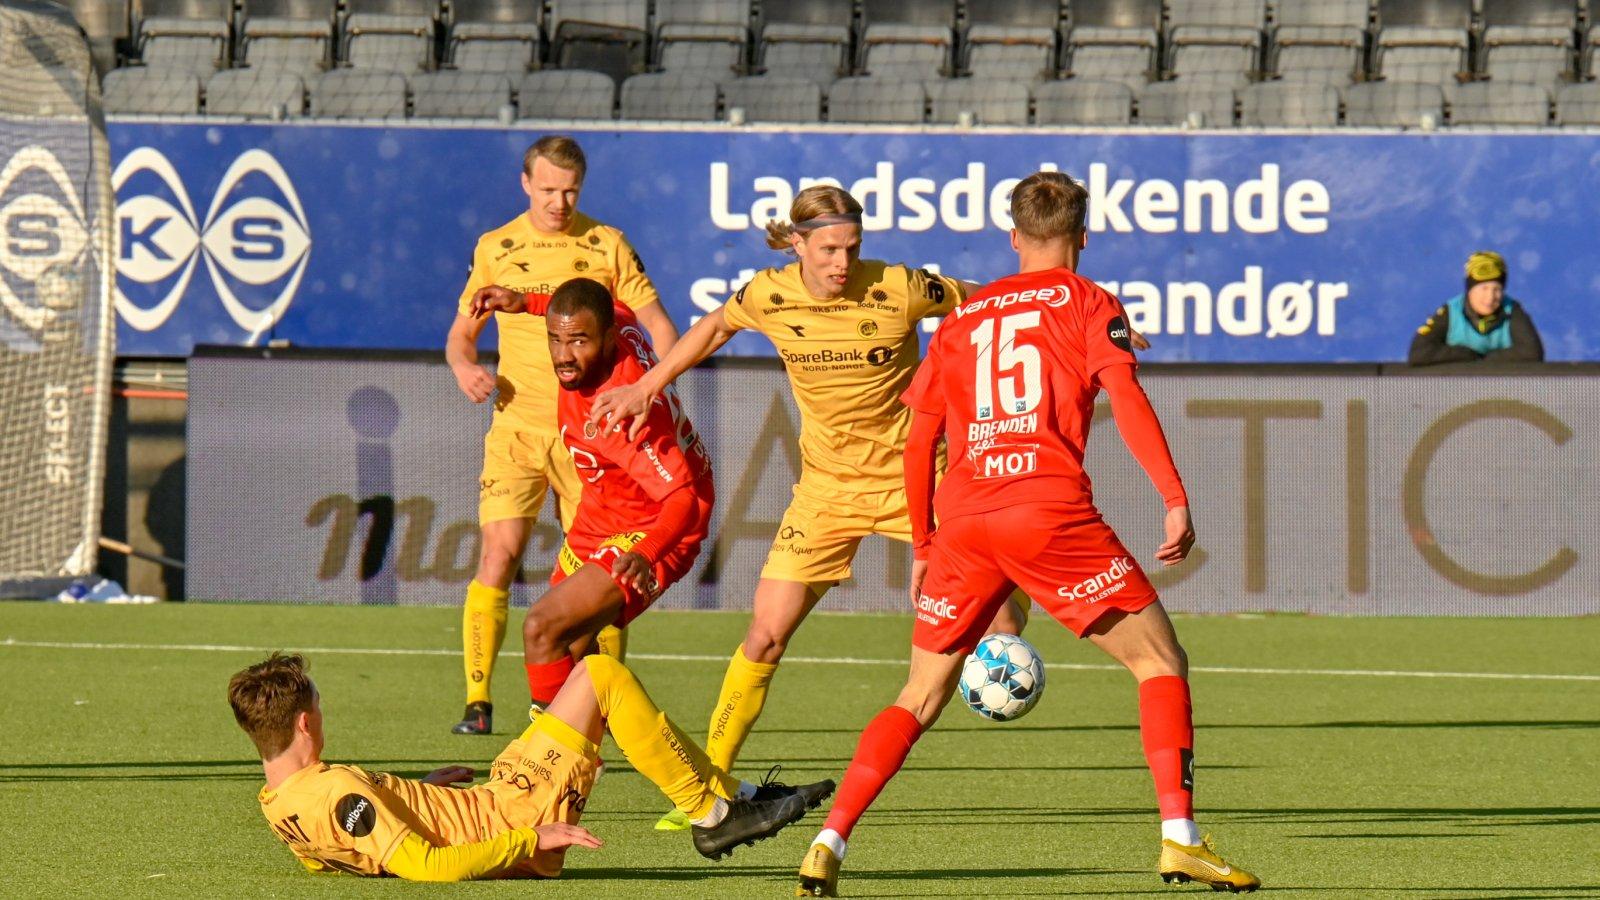 Bodø/Glimt under kampen mot Lillestrøm på Aspmyra.